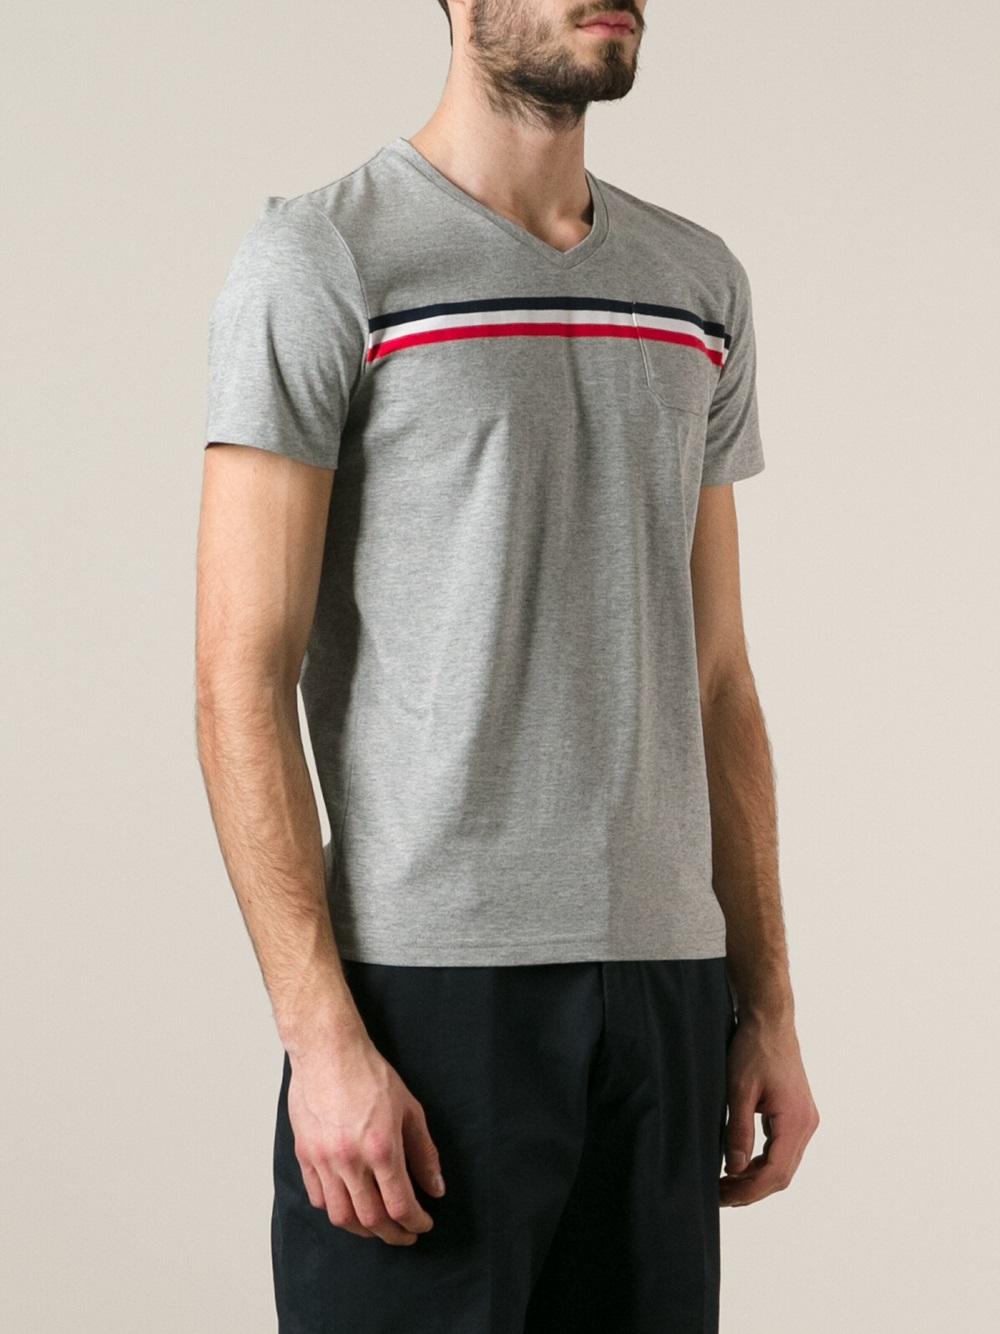 Moncler stripe tshirt in gray for men lyst Grey striped t shirt